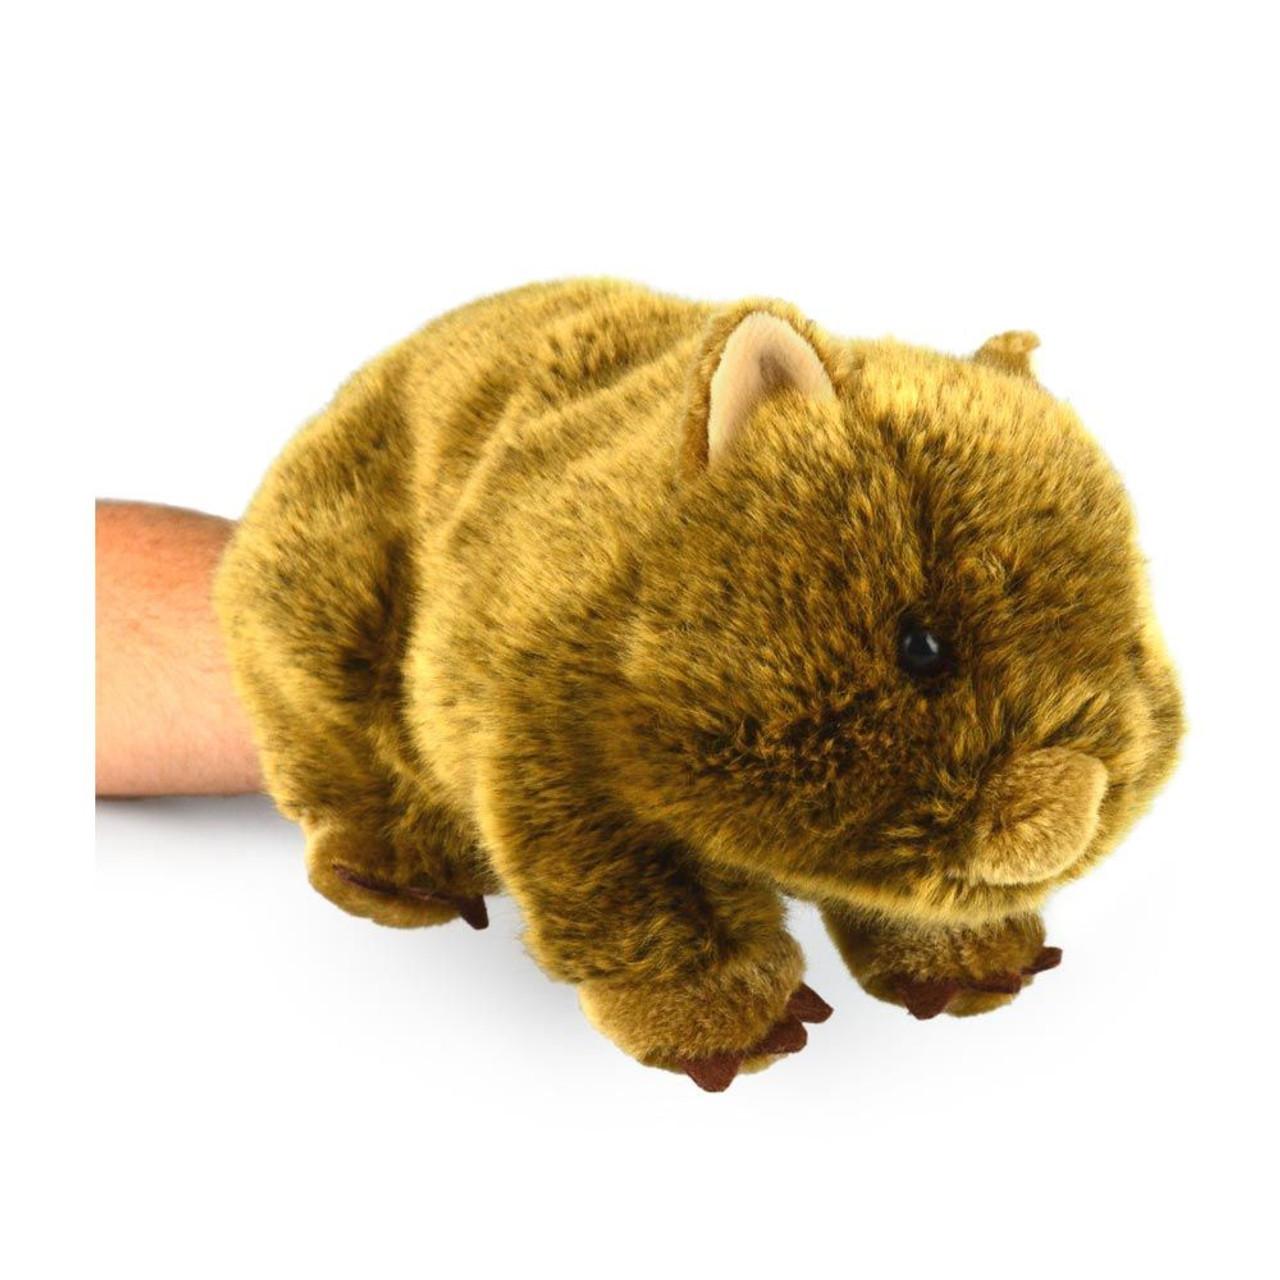 Korimco Wildlife Body Puppet 32cm WOMBAT at Baby Barn Discounts